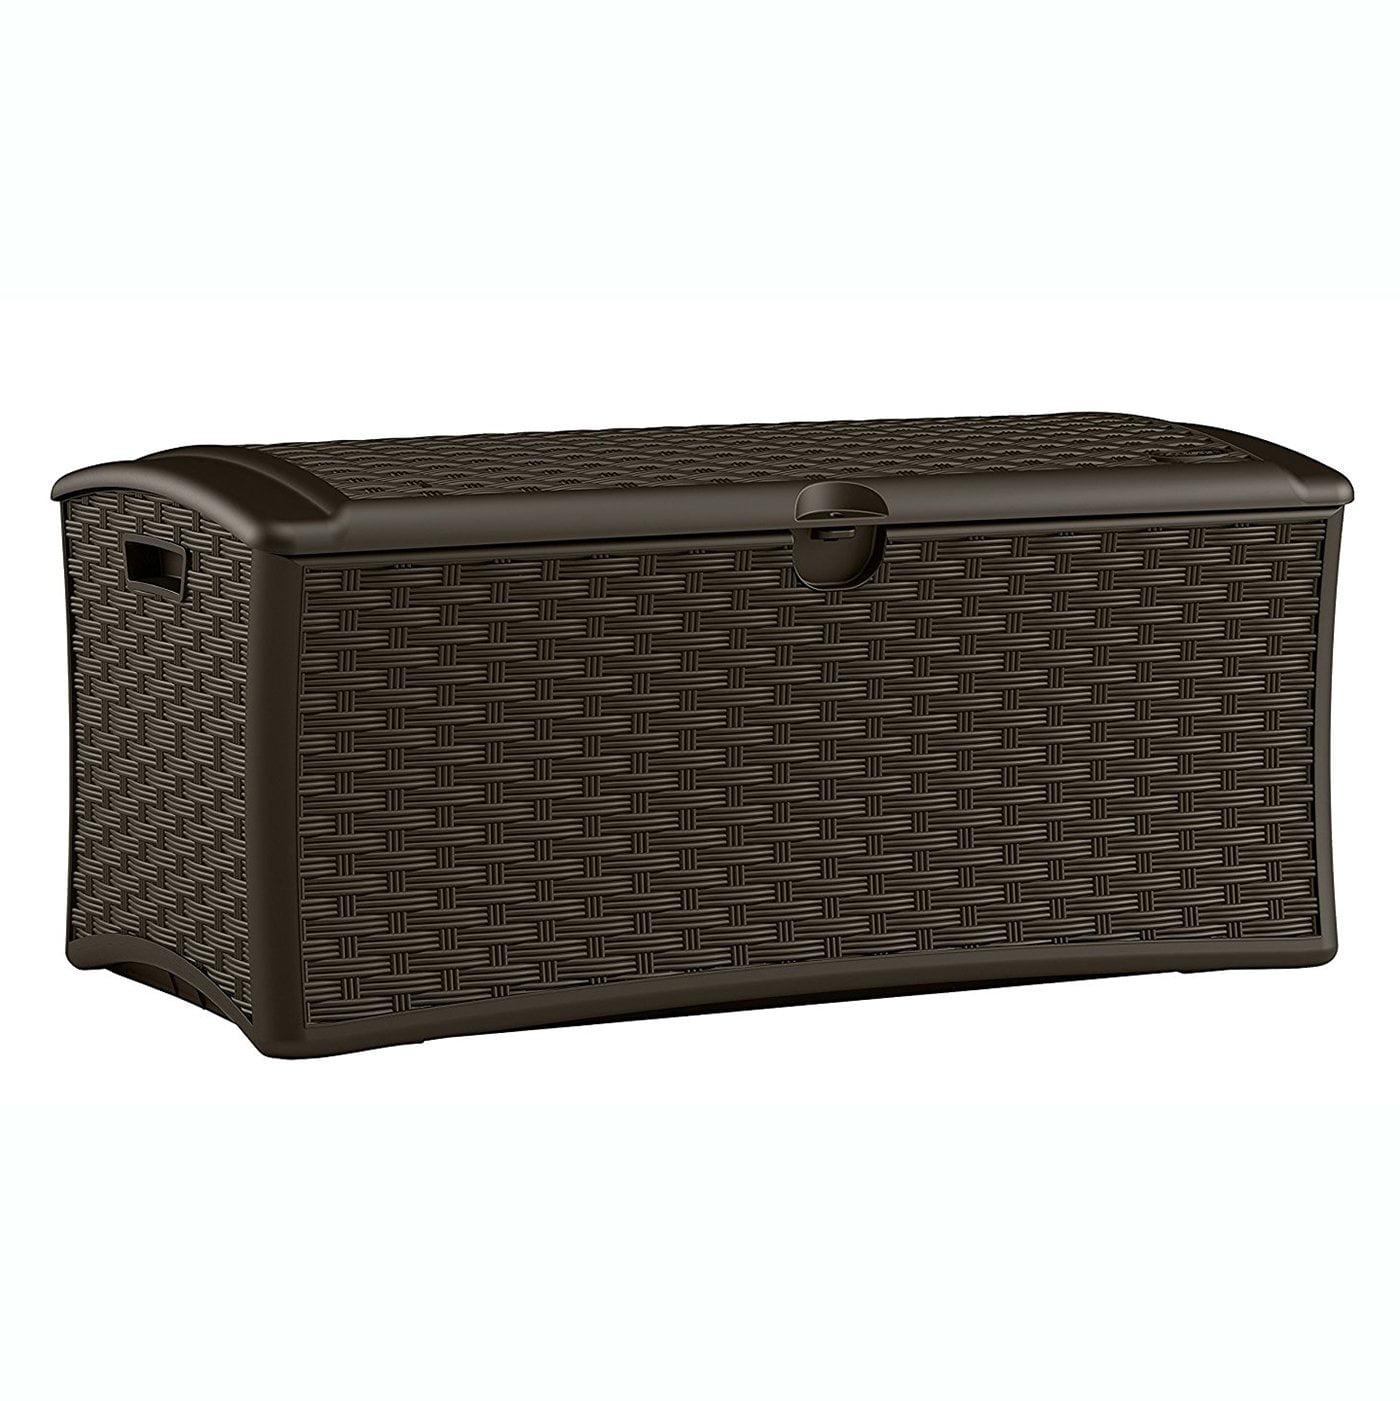 Suncast 72 Gallon Capacity Resin Wicker Outdoor Patio Storage Deck Box, Brown